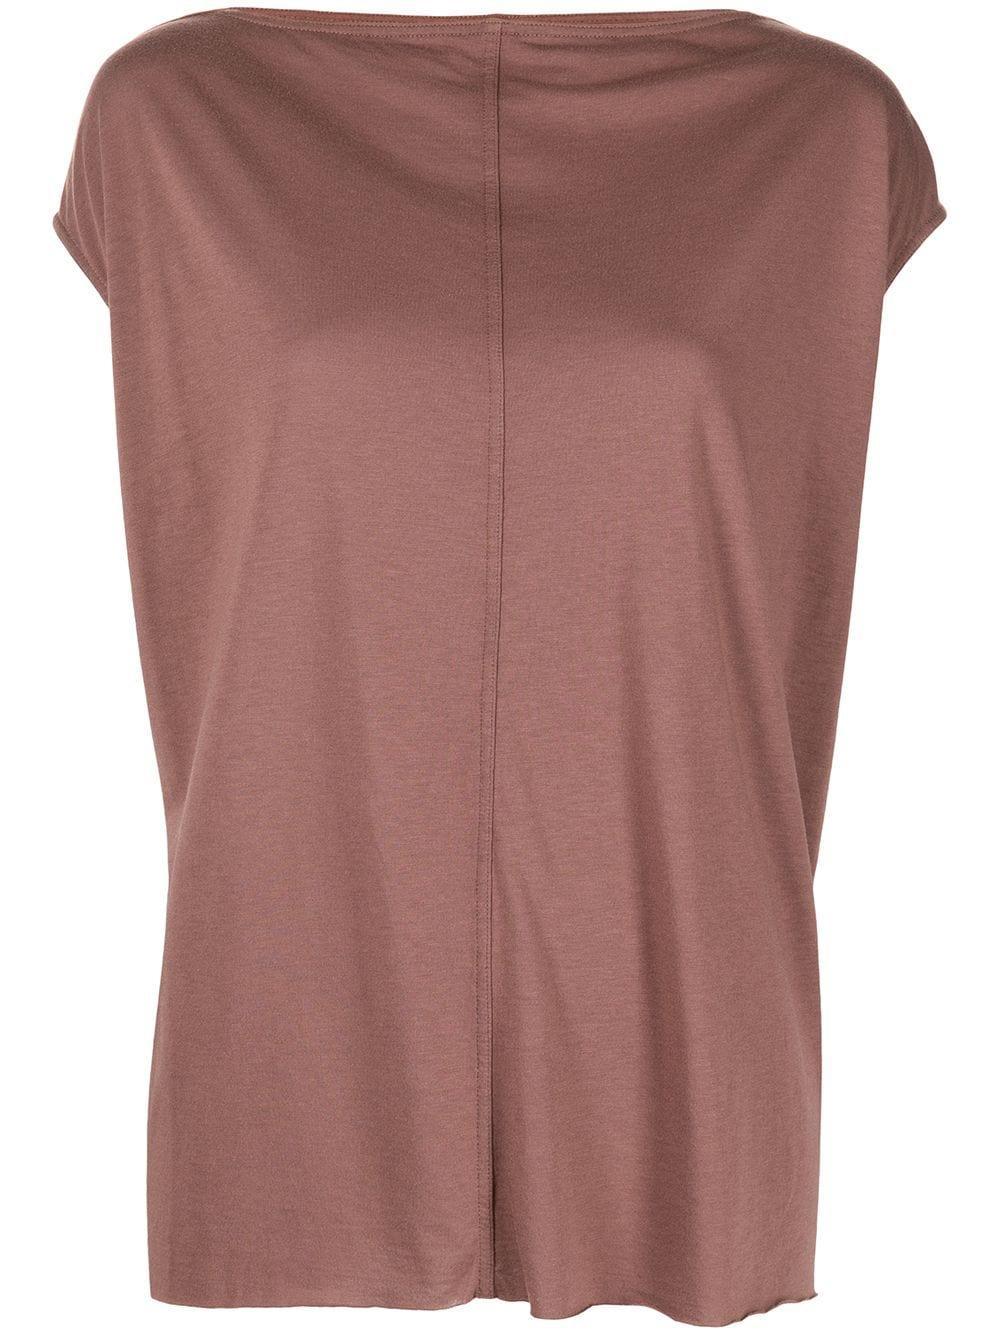 Cap Sleeve Knit Top Item # LI21S1103